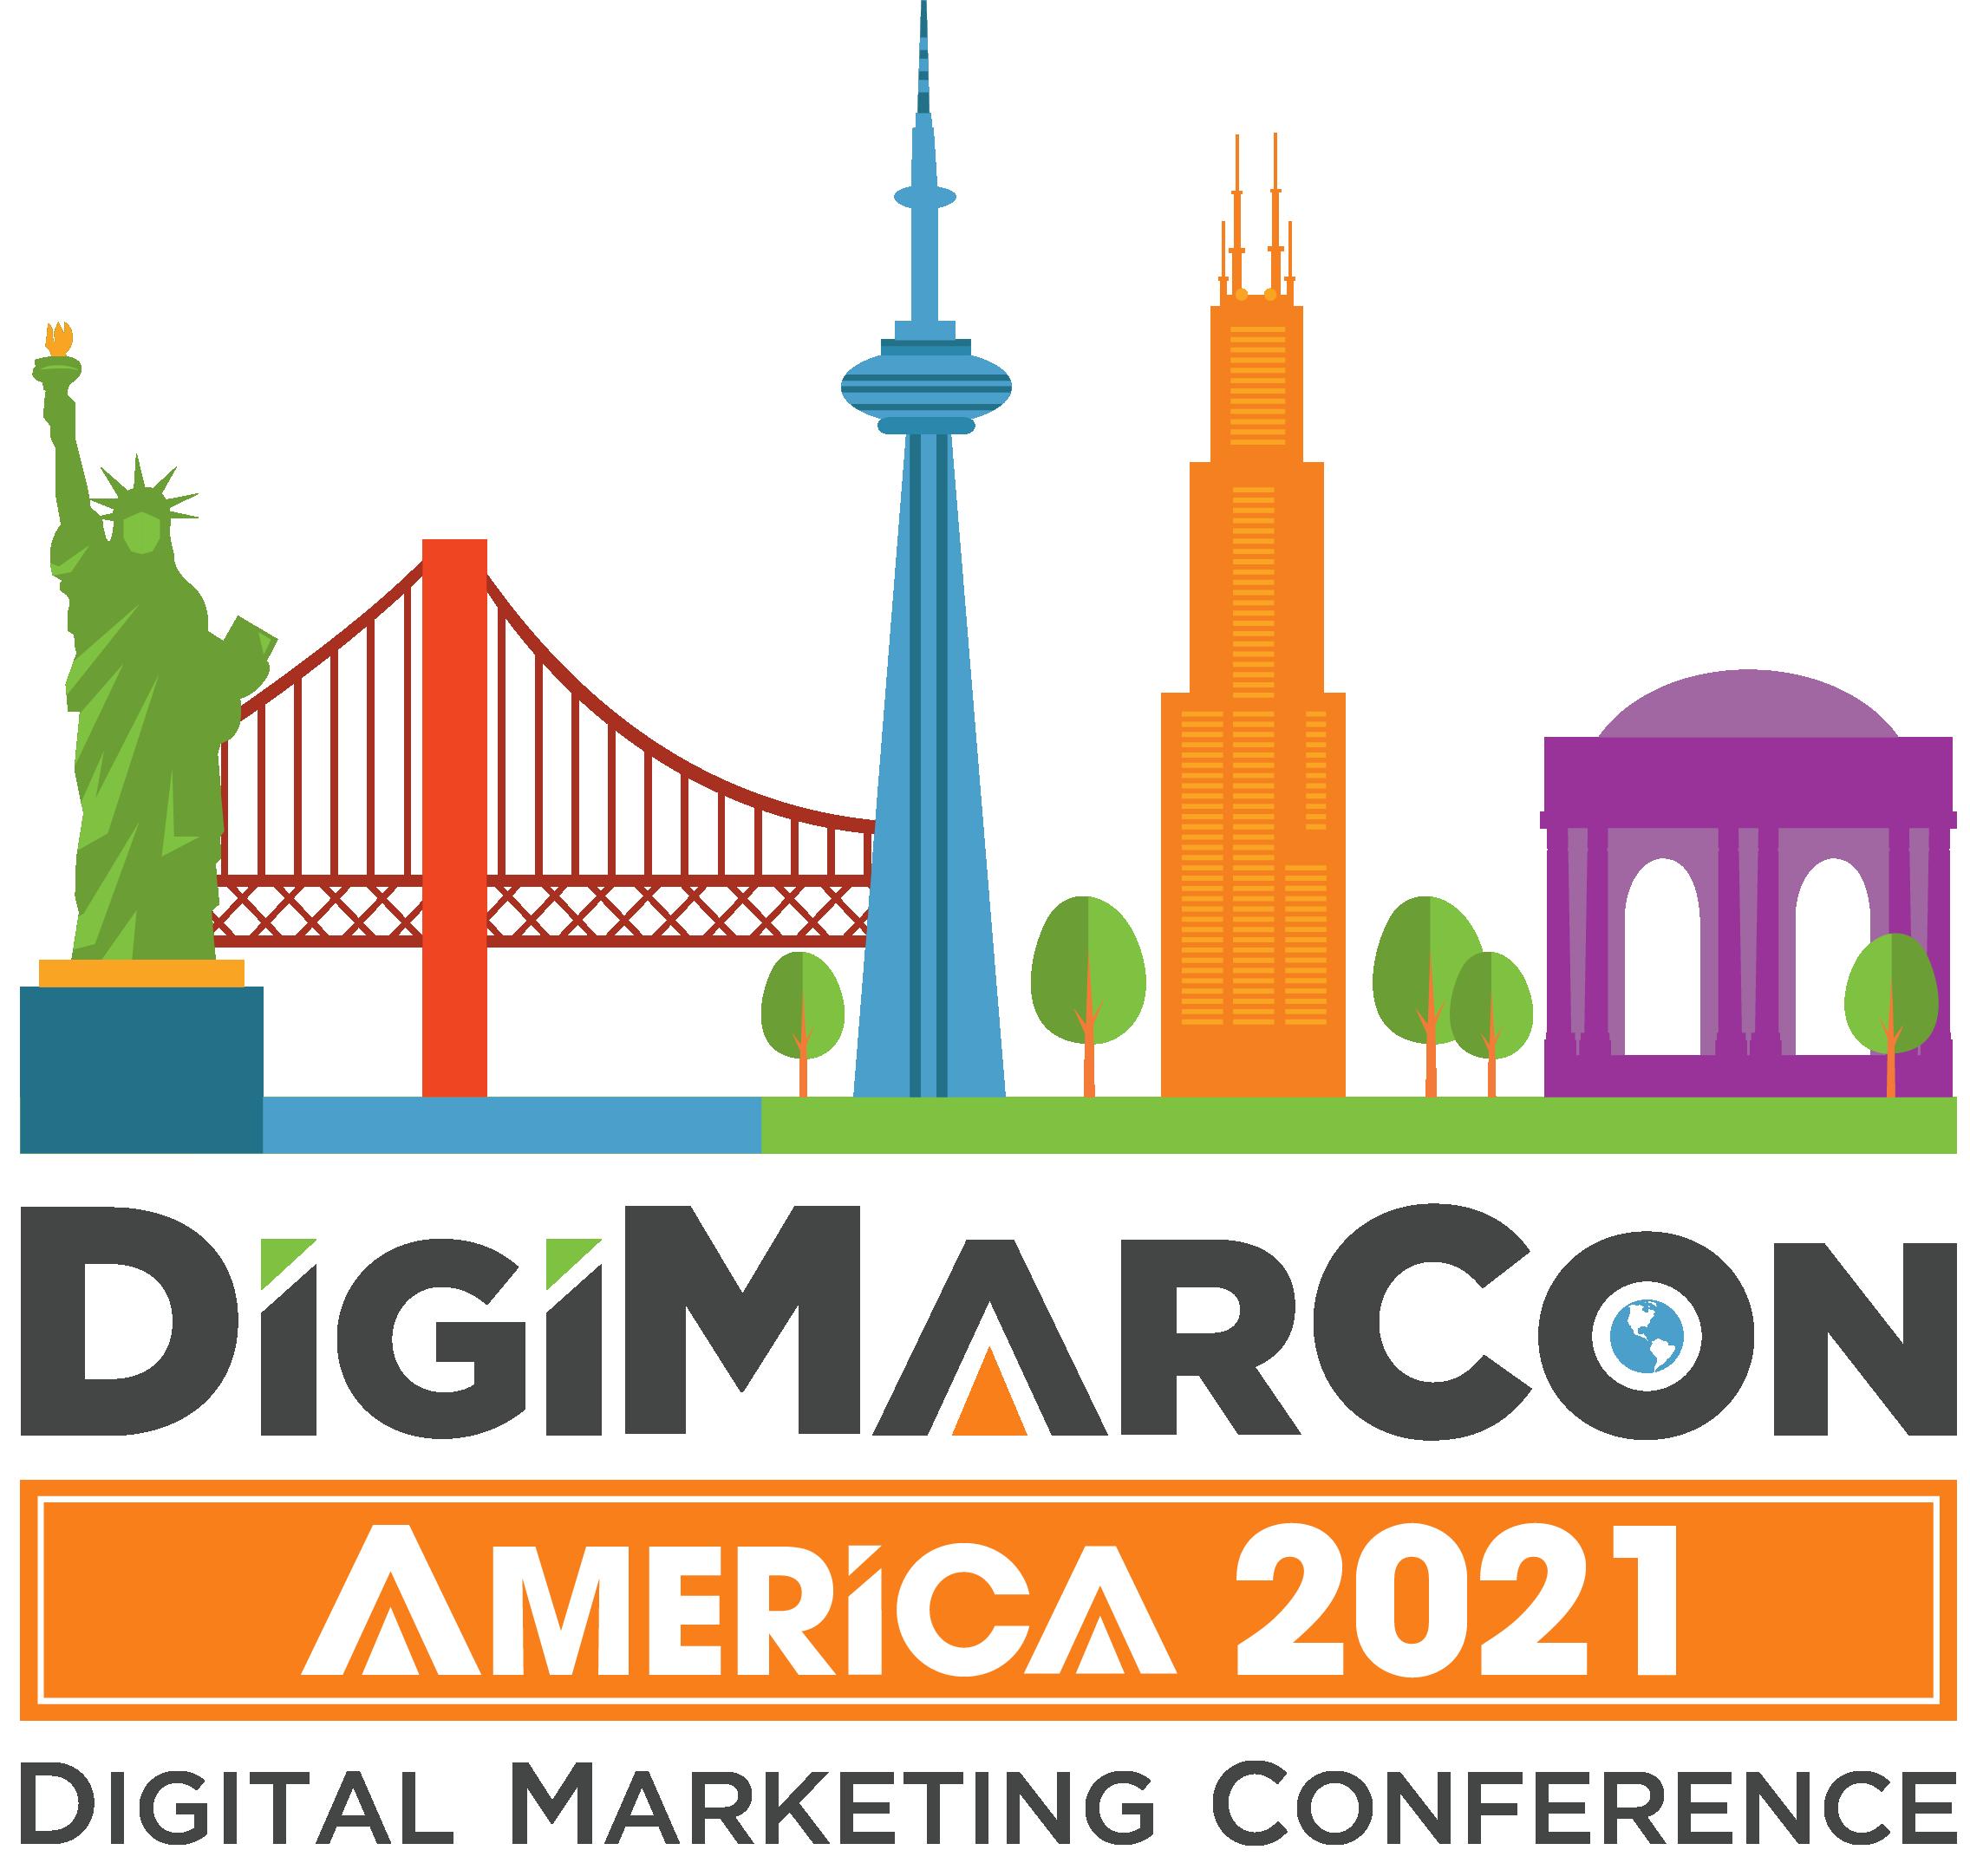 digimarcon-america-2021